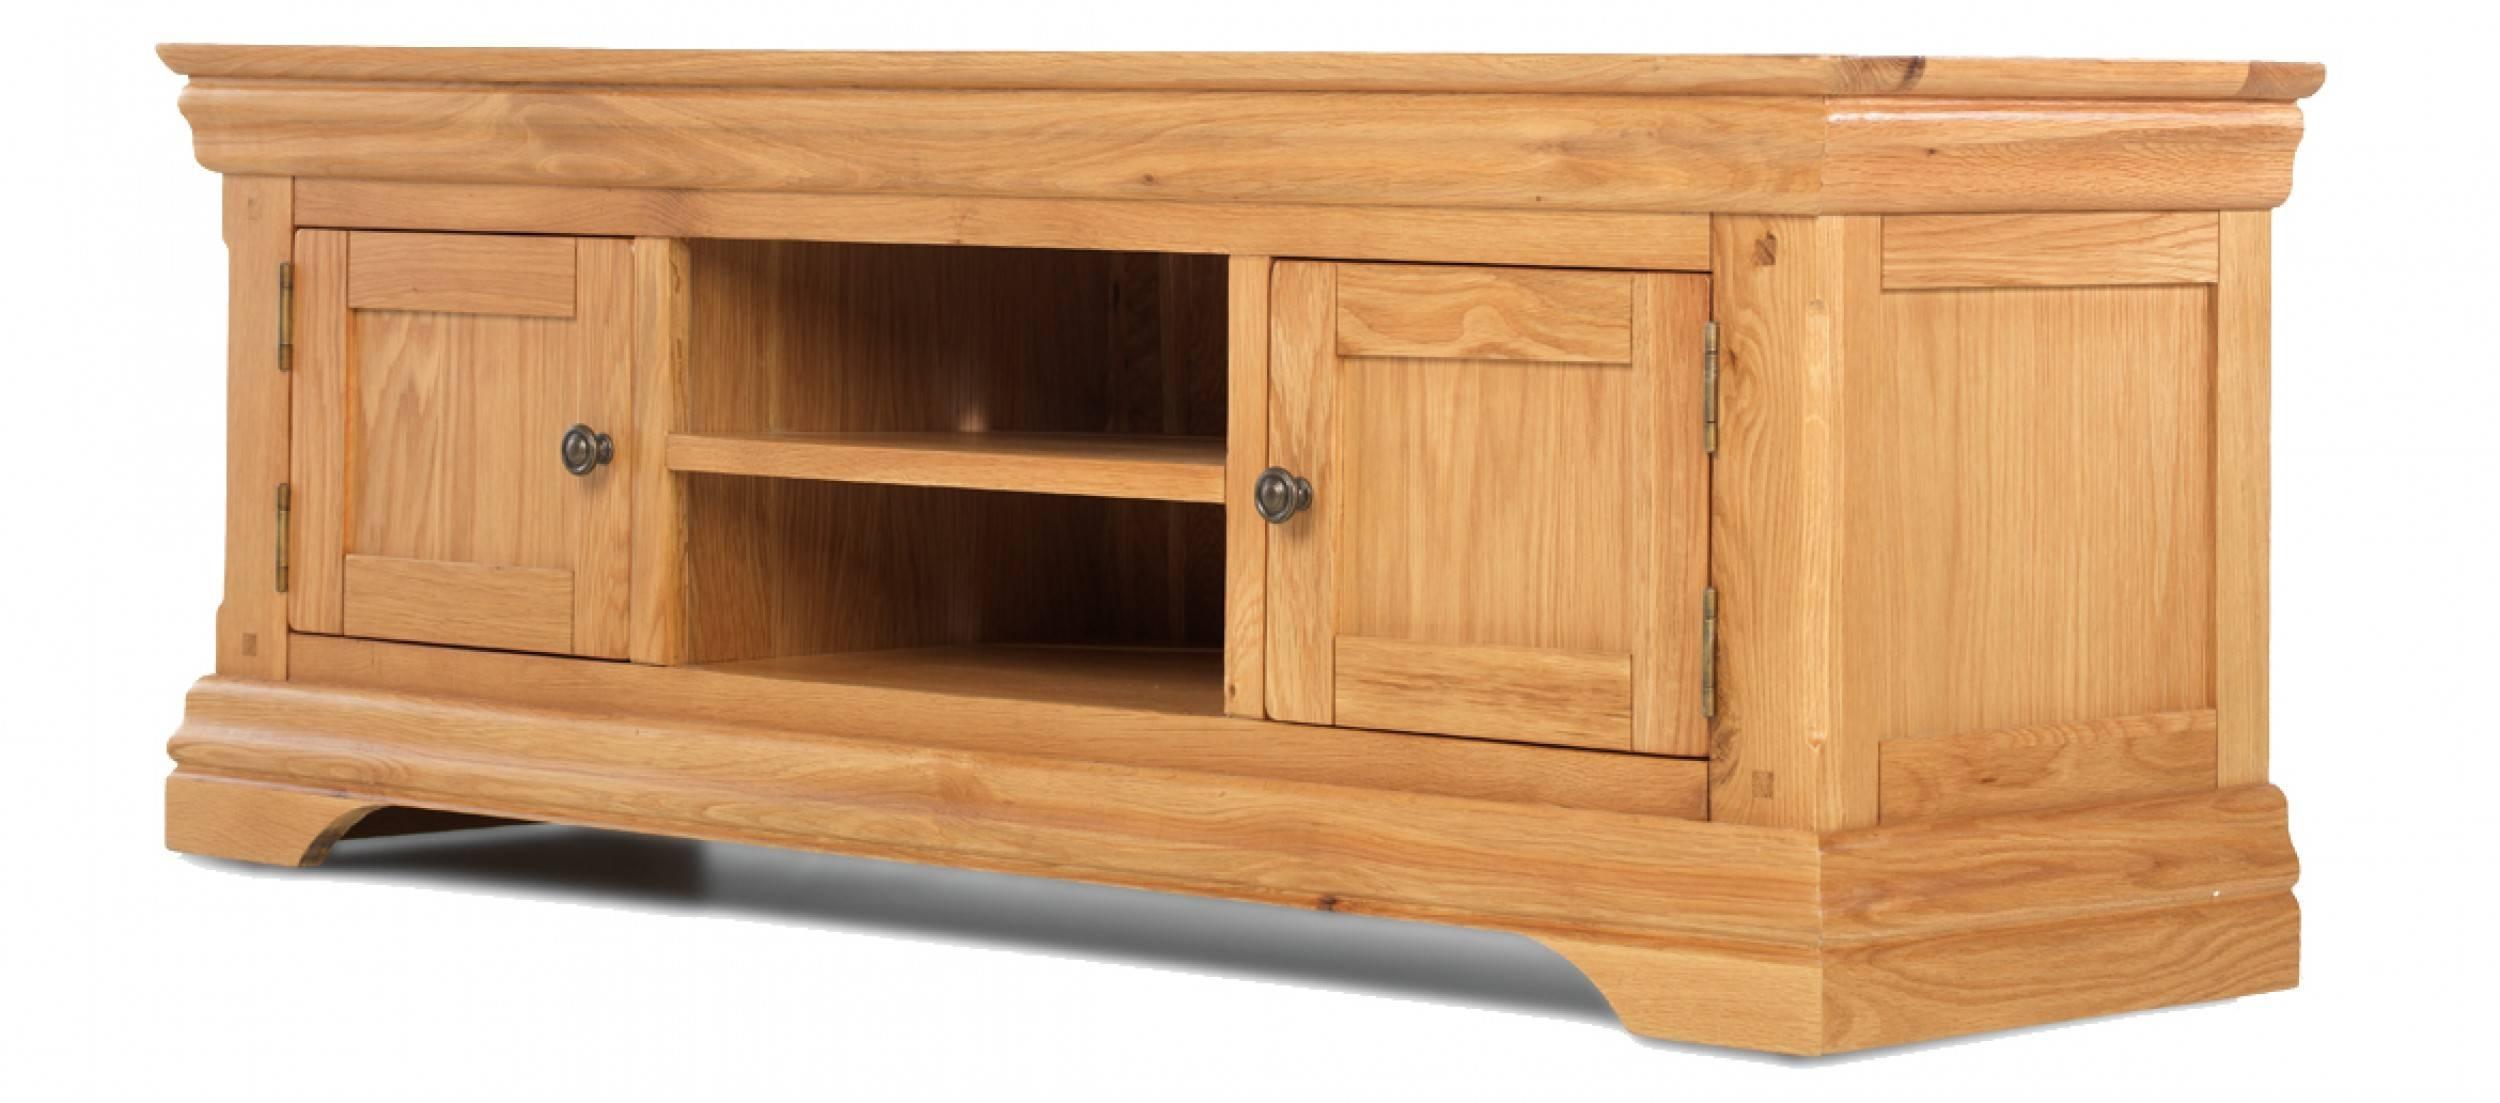 Constance Oak Plasma Tv Stand | Quercus Living with regard to Plasma Tv Stands (Image 1 of 15)